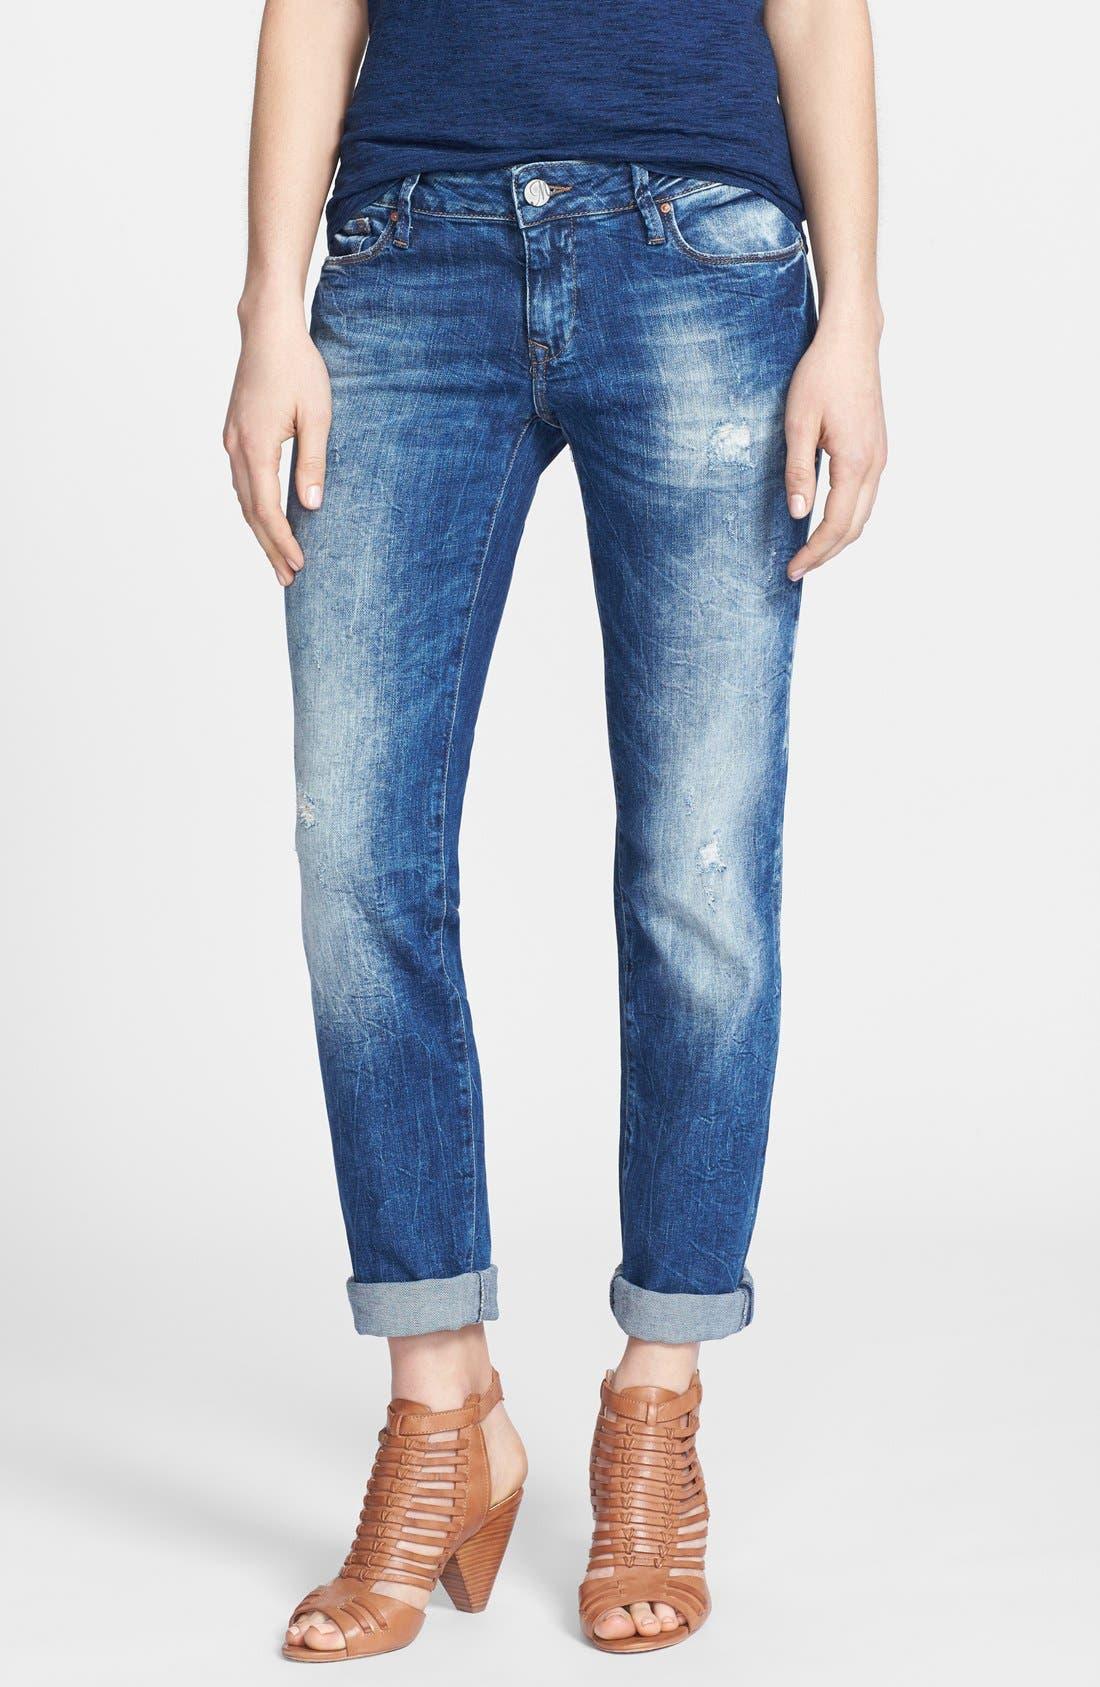 Alternate Image 1 Selected - Mavi Jeans 'Emma' Distressed Slim Fit Boyfriend Jeans (Vintage)